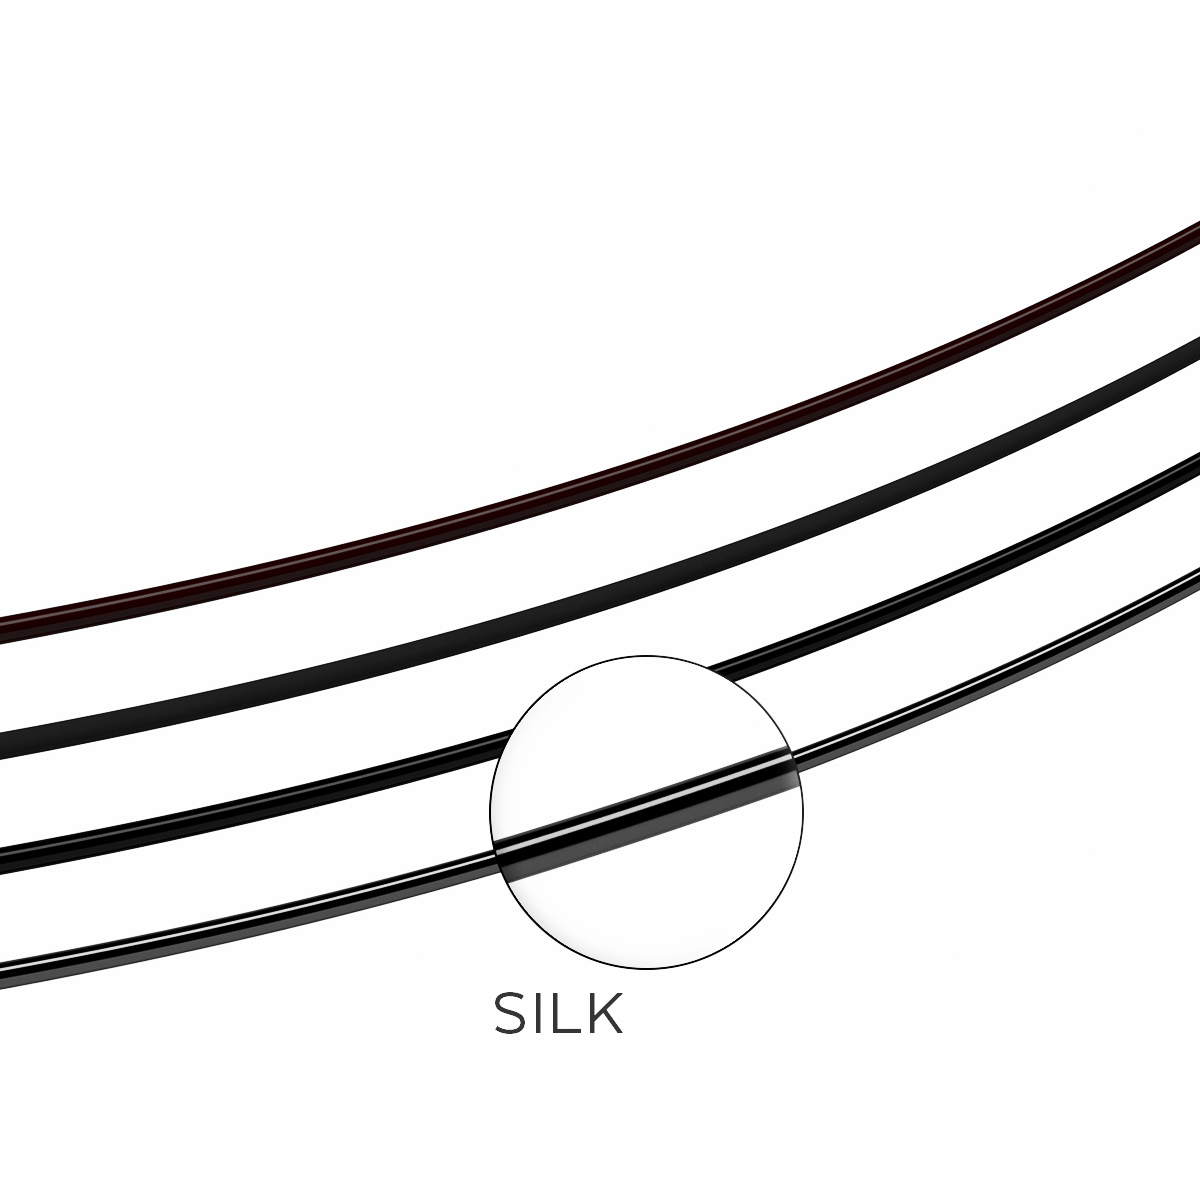 rzesy-silk-black-c-0-15